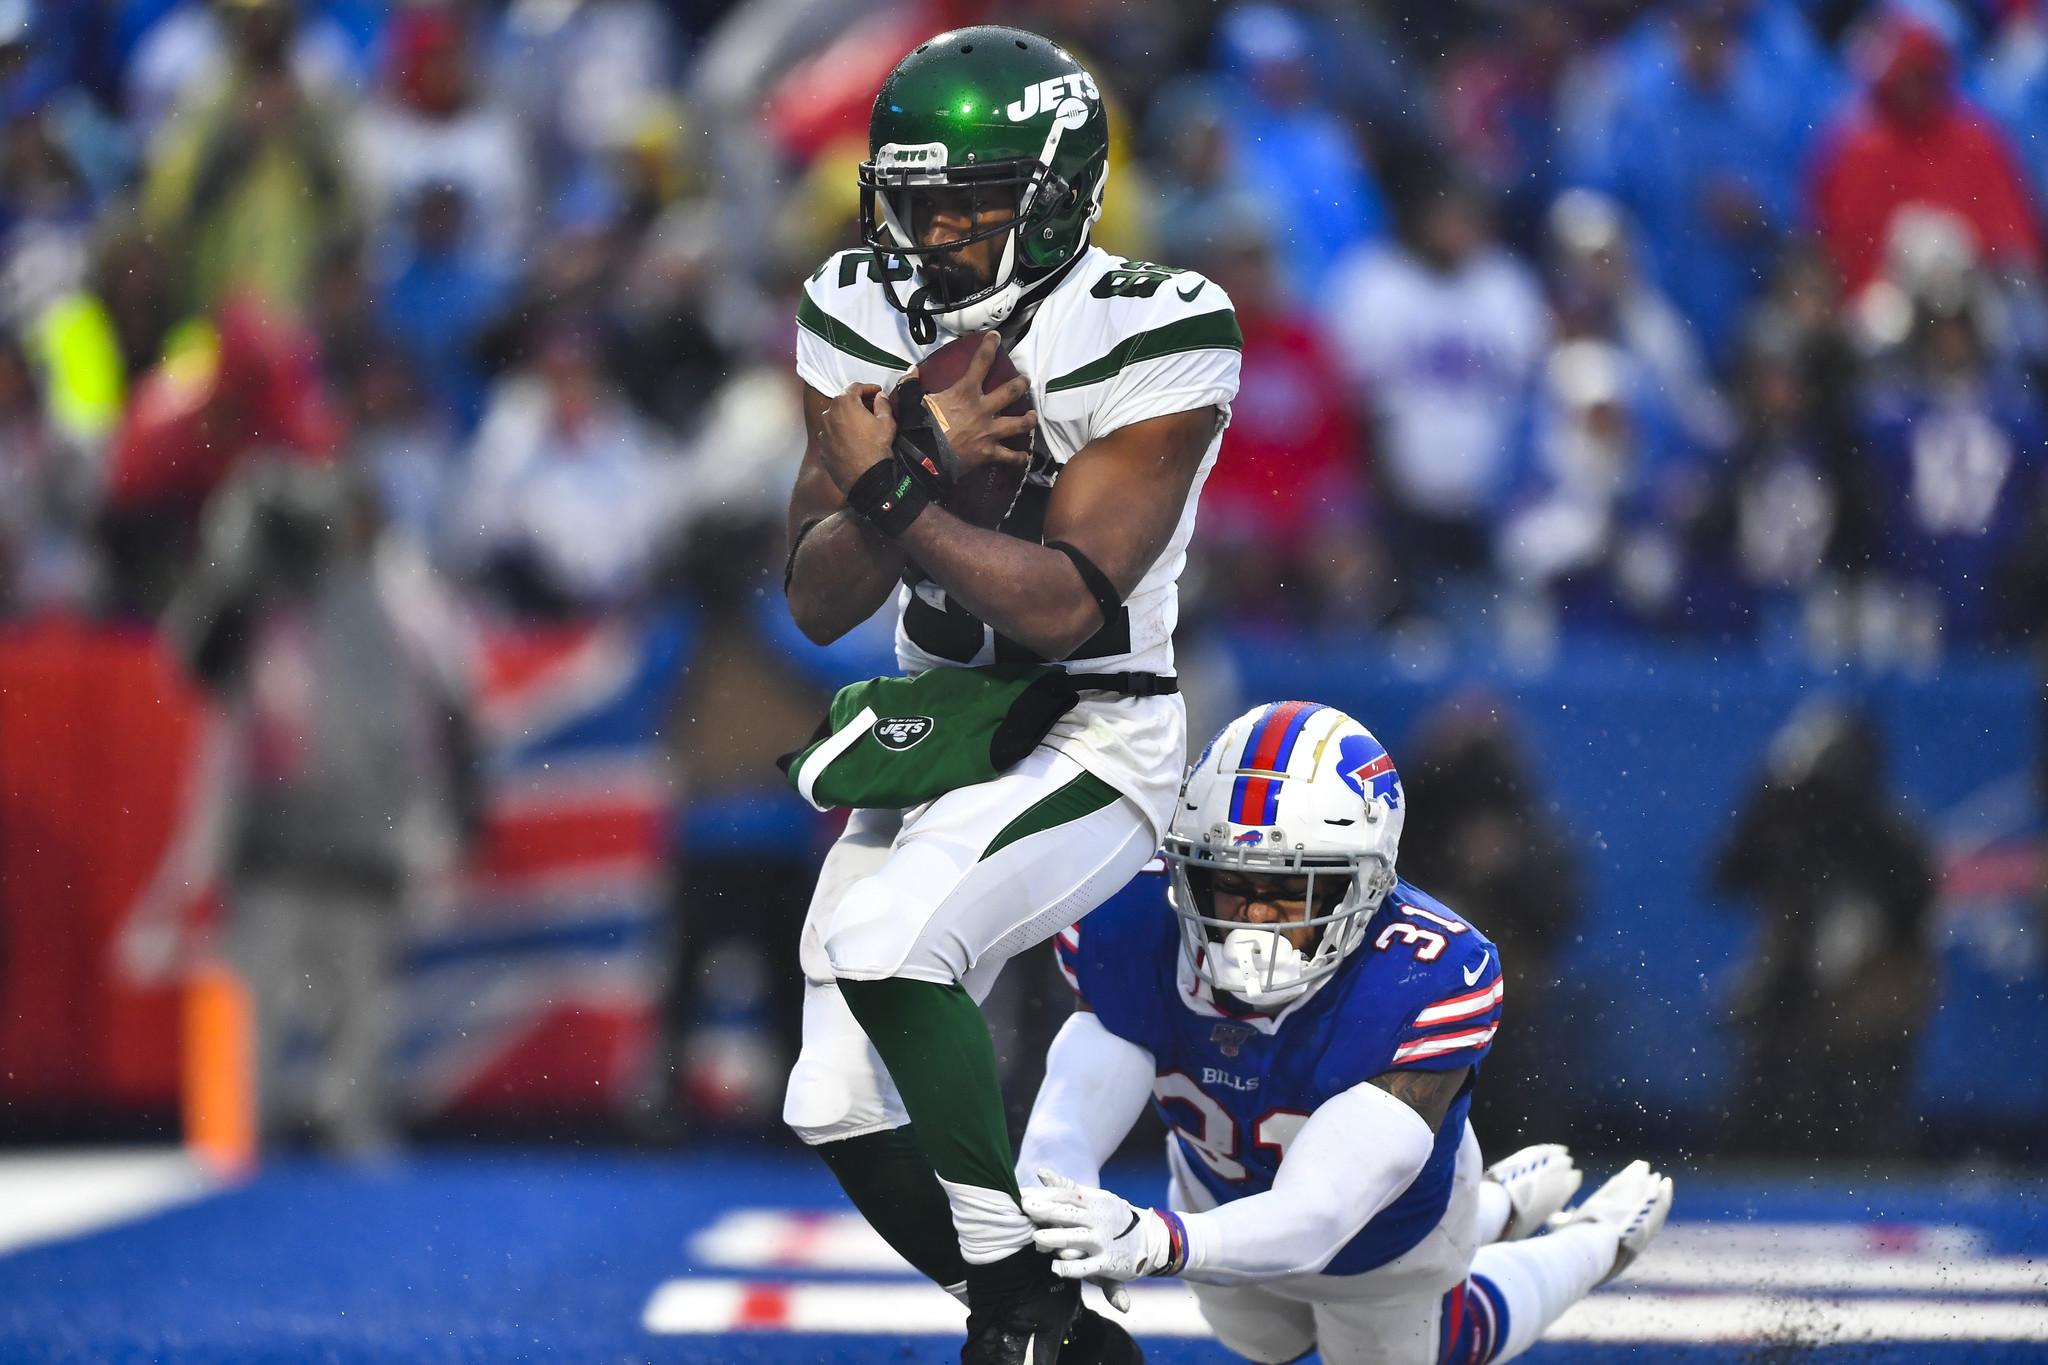 Jets beat Bills backups in unimpressive season-finale